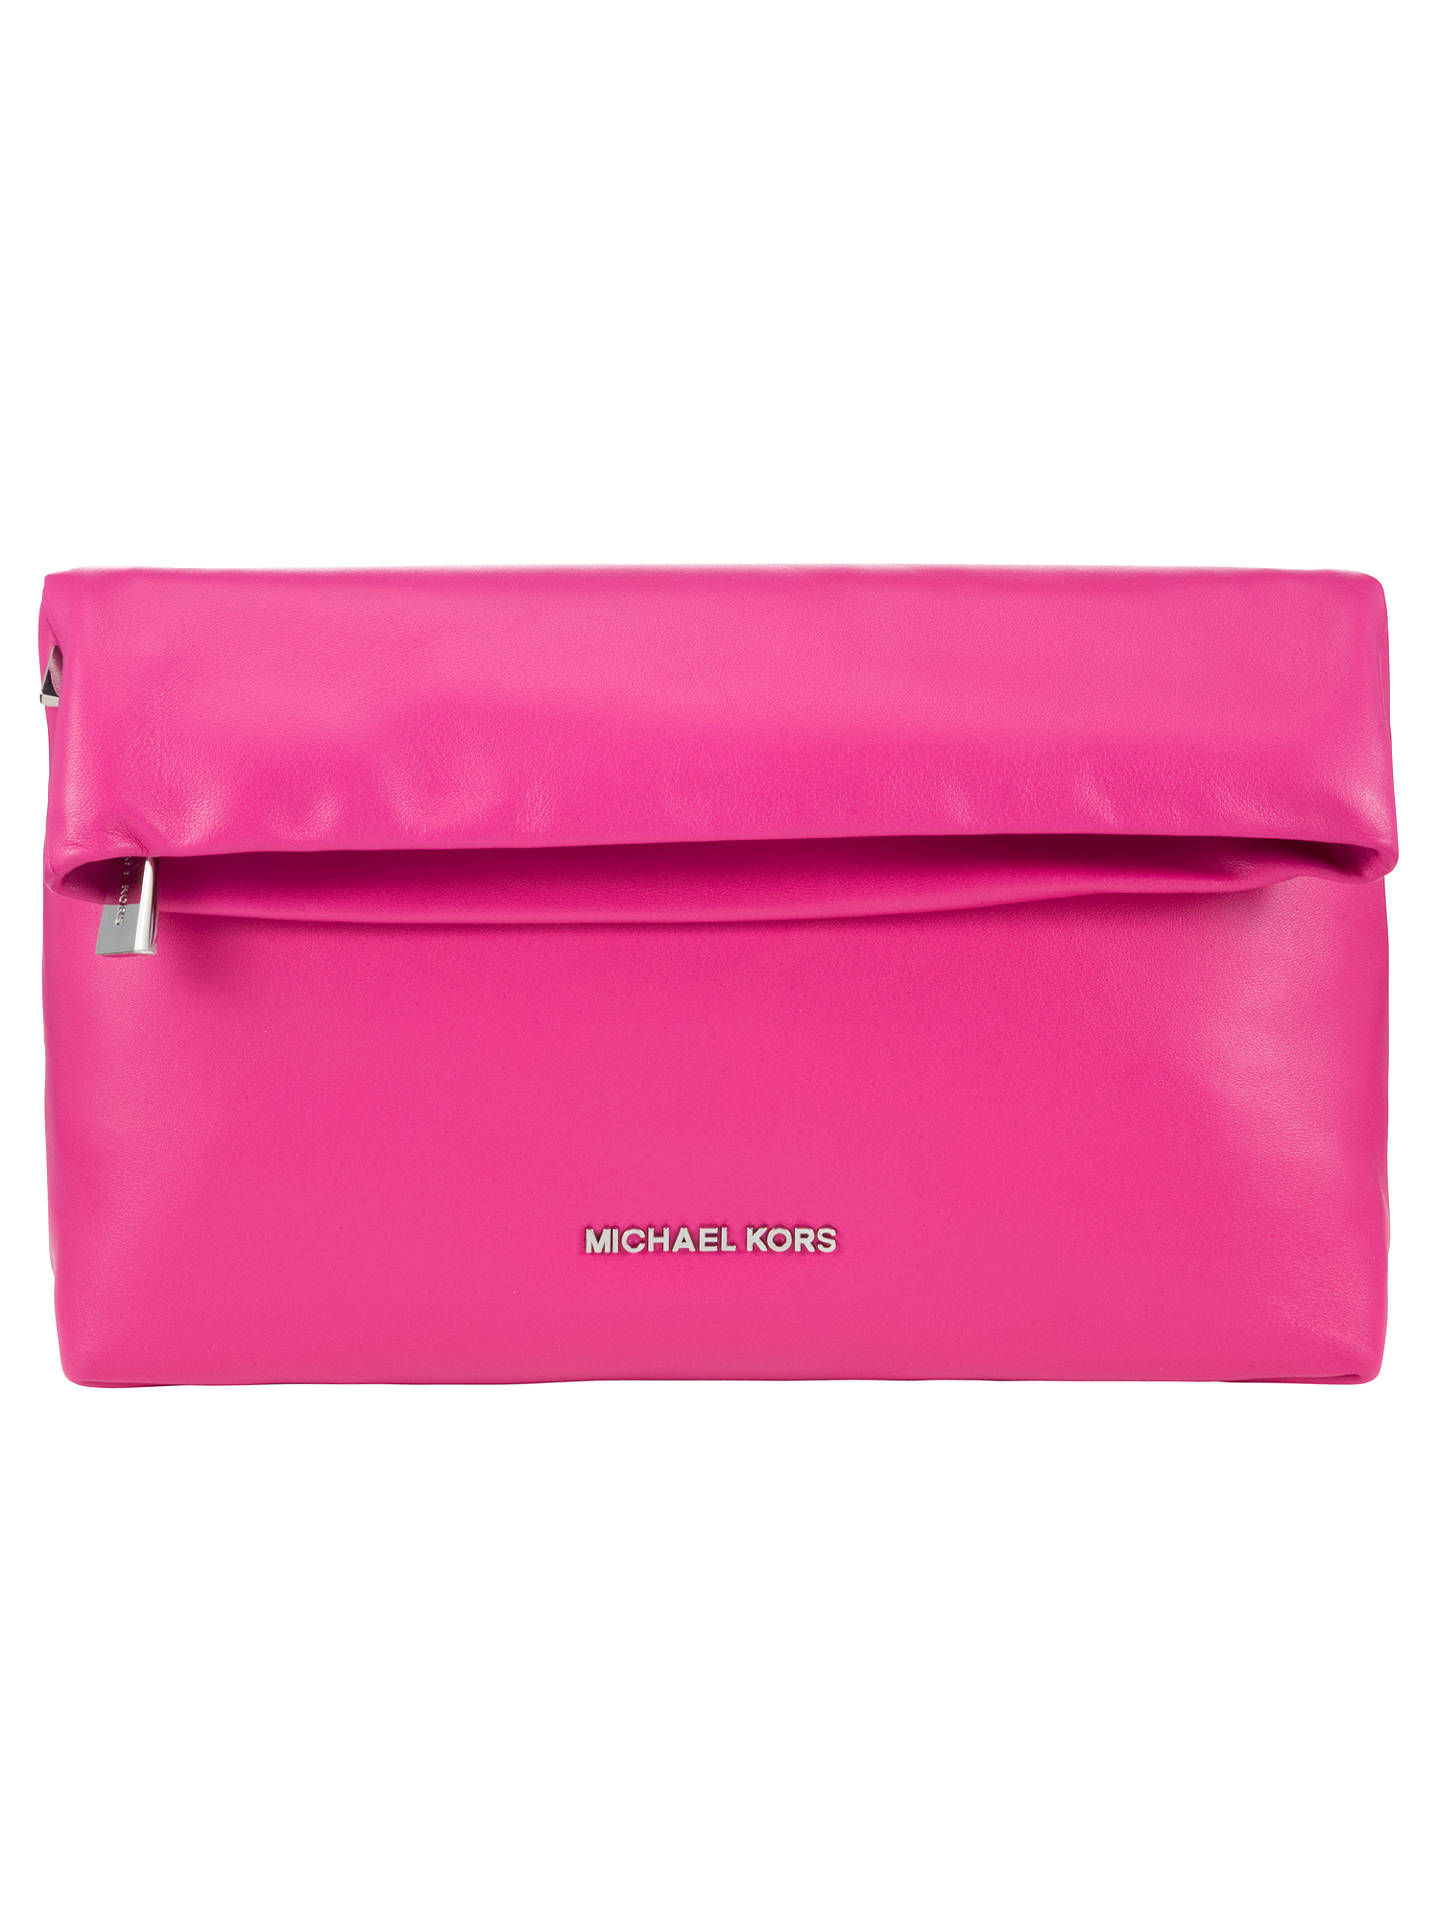 1568b29cc7c6 ... shop buymichael michael kors daria fold over leather clutch bag  raspberry online at johnlewis 4398d 0275f